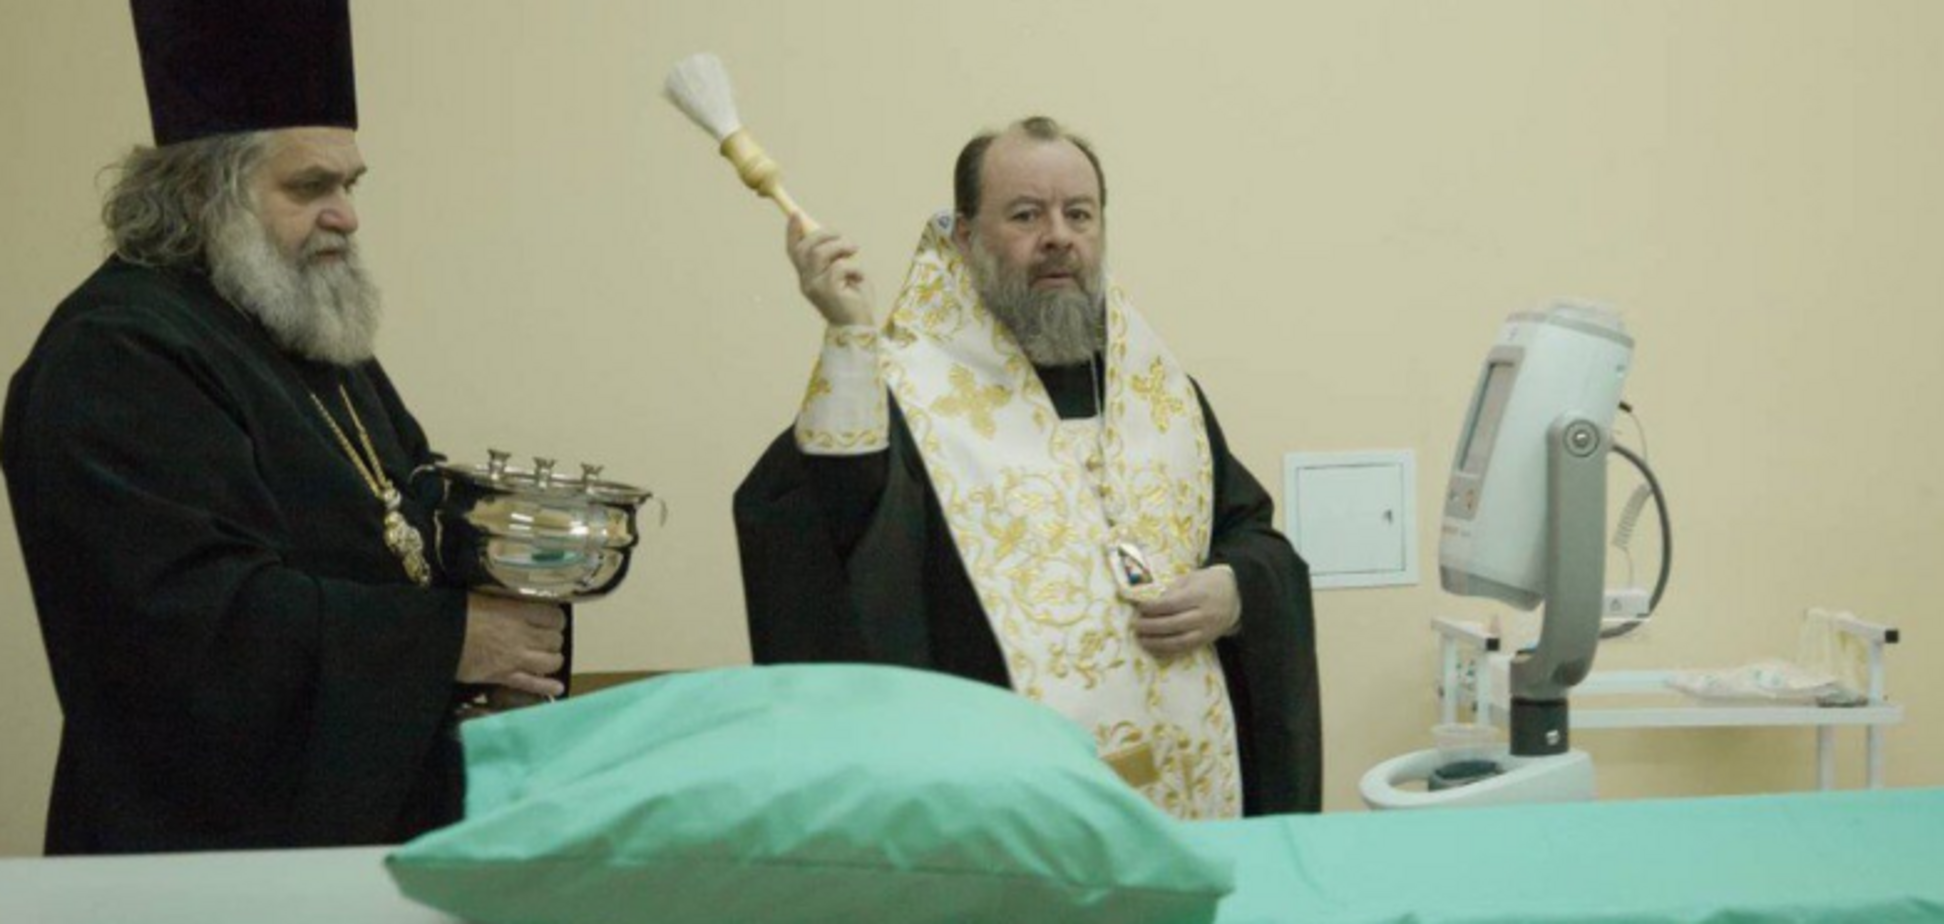 Священник УПЦ МП опять пригодился террористам 'ЛНР'